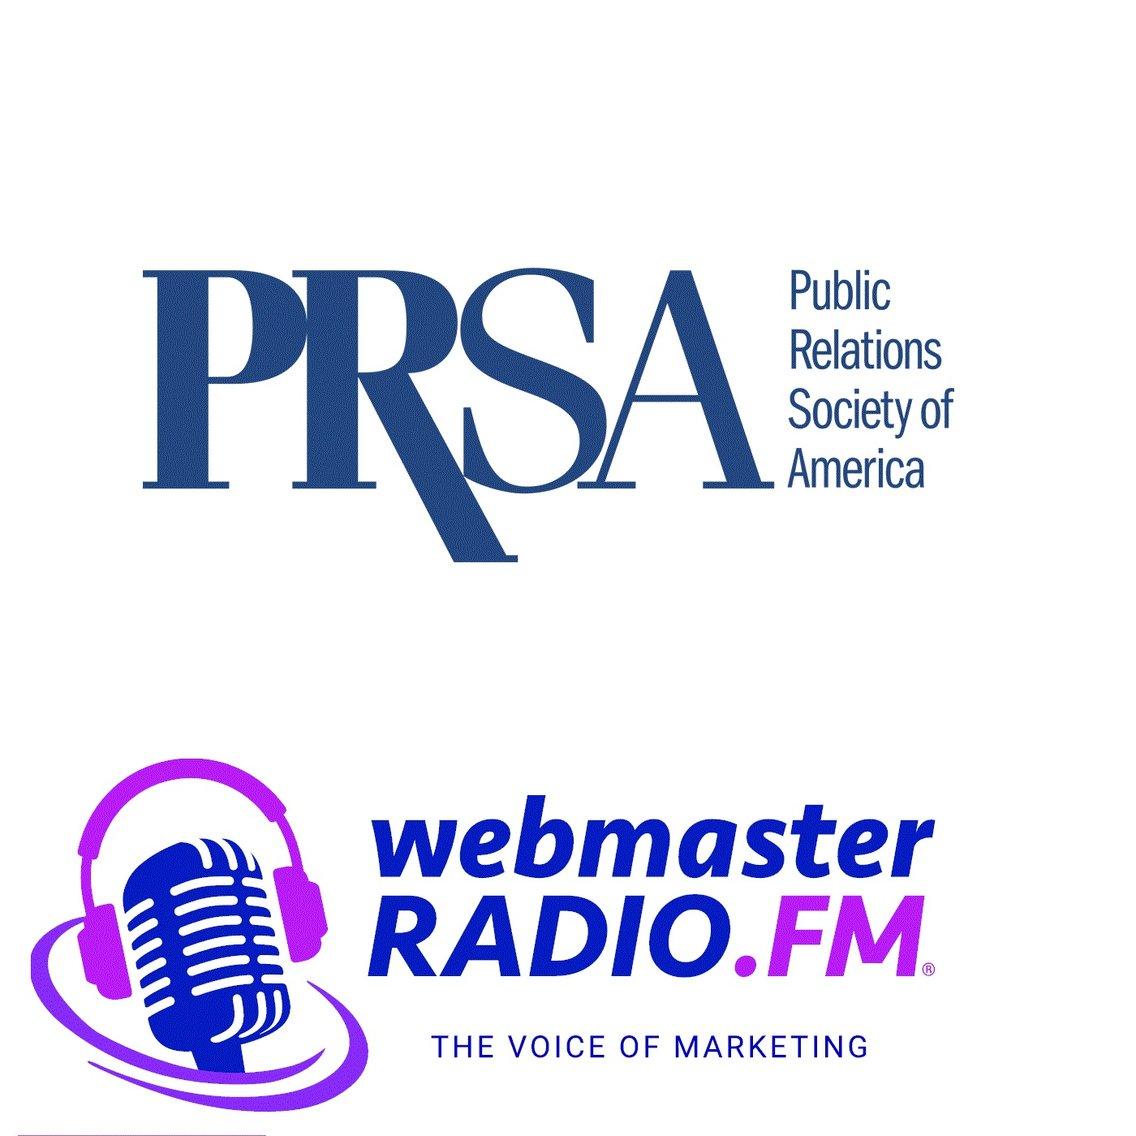 PRSA Conference - imagen de portada